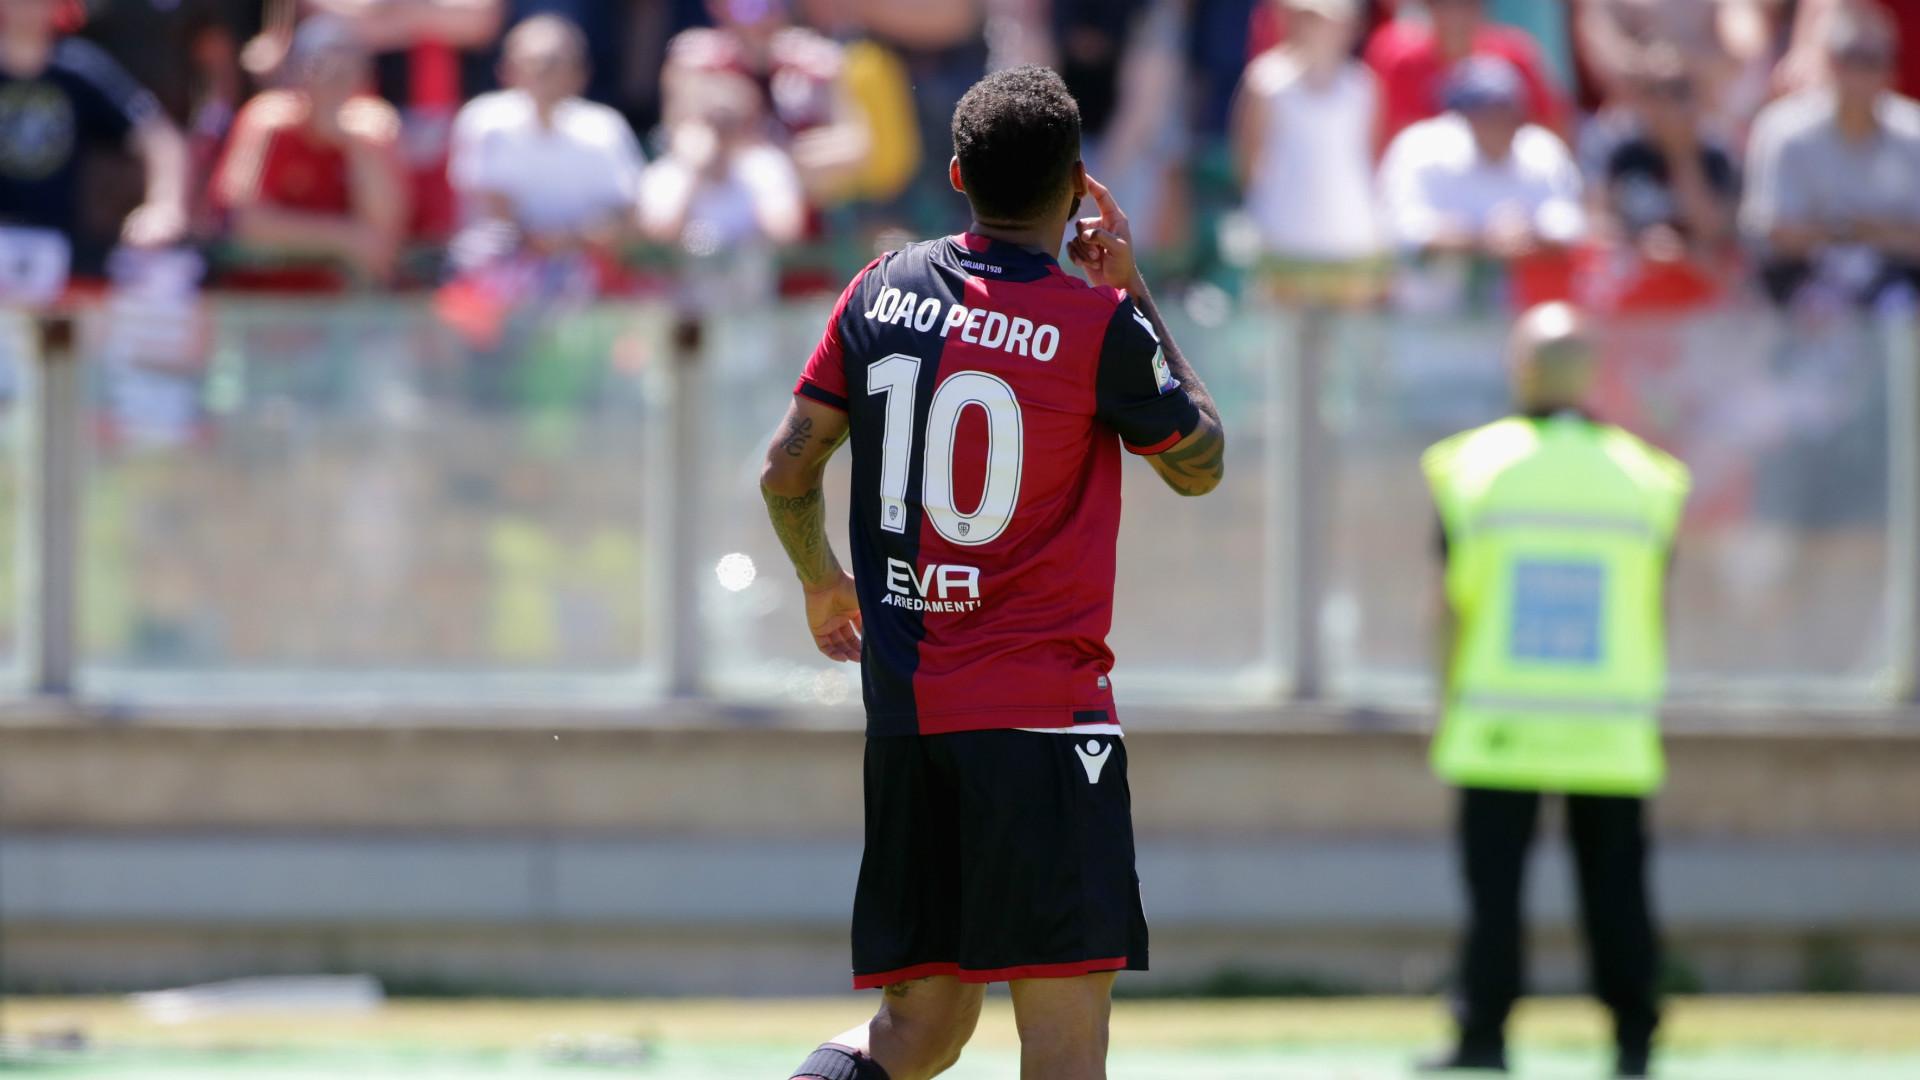 Fiorentina e Cagliari, insieme per Astori. Giulini conferma: